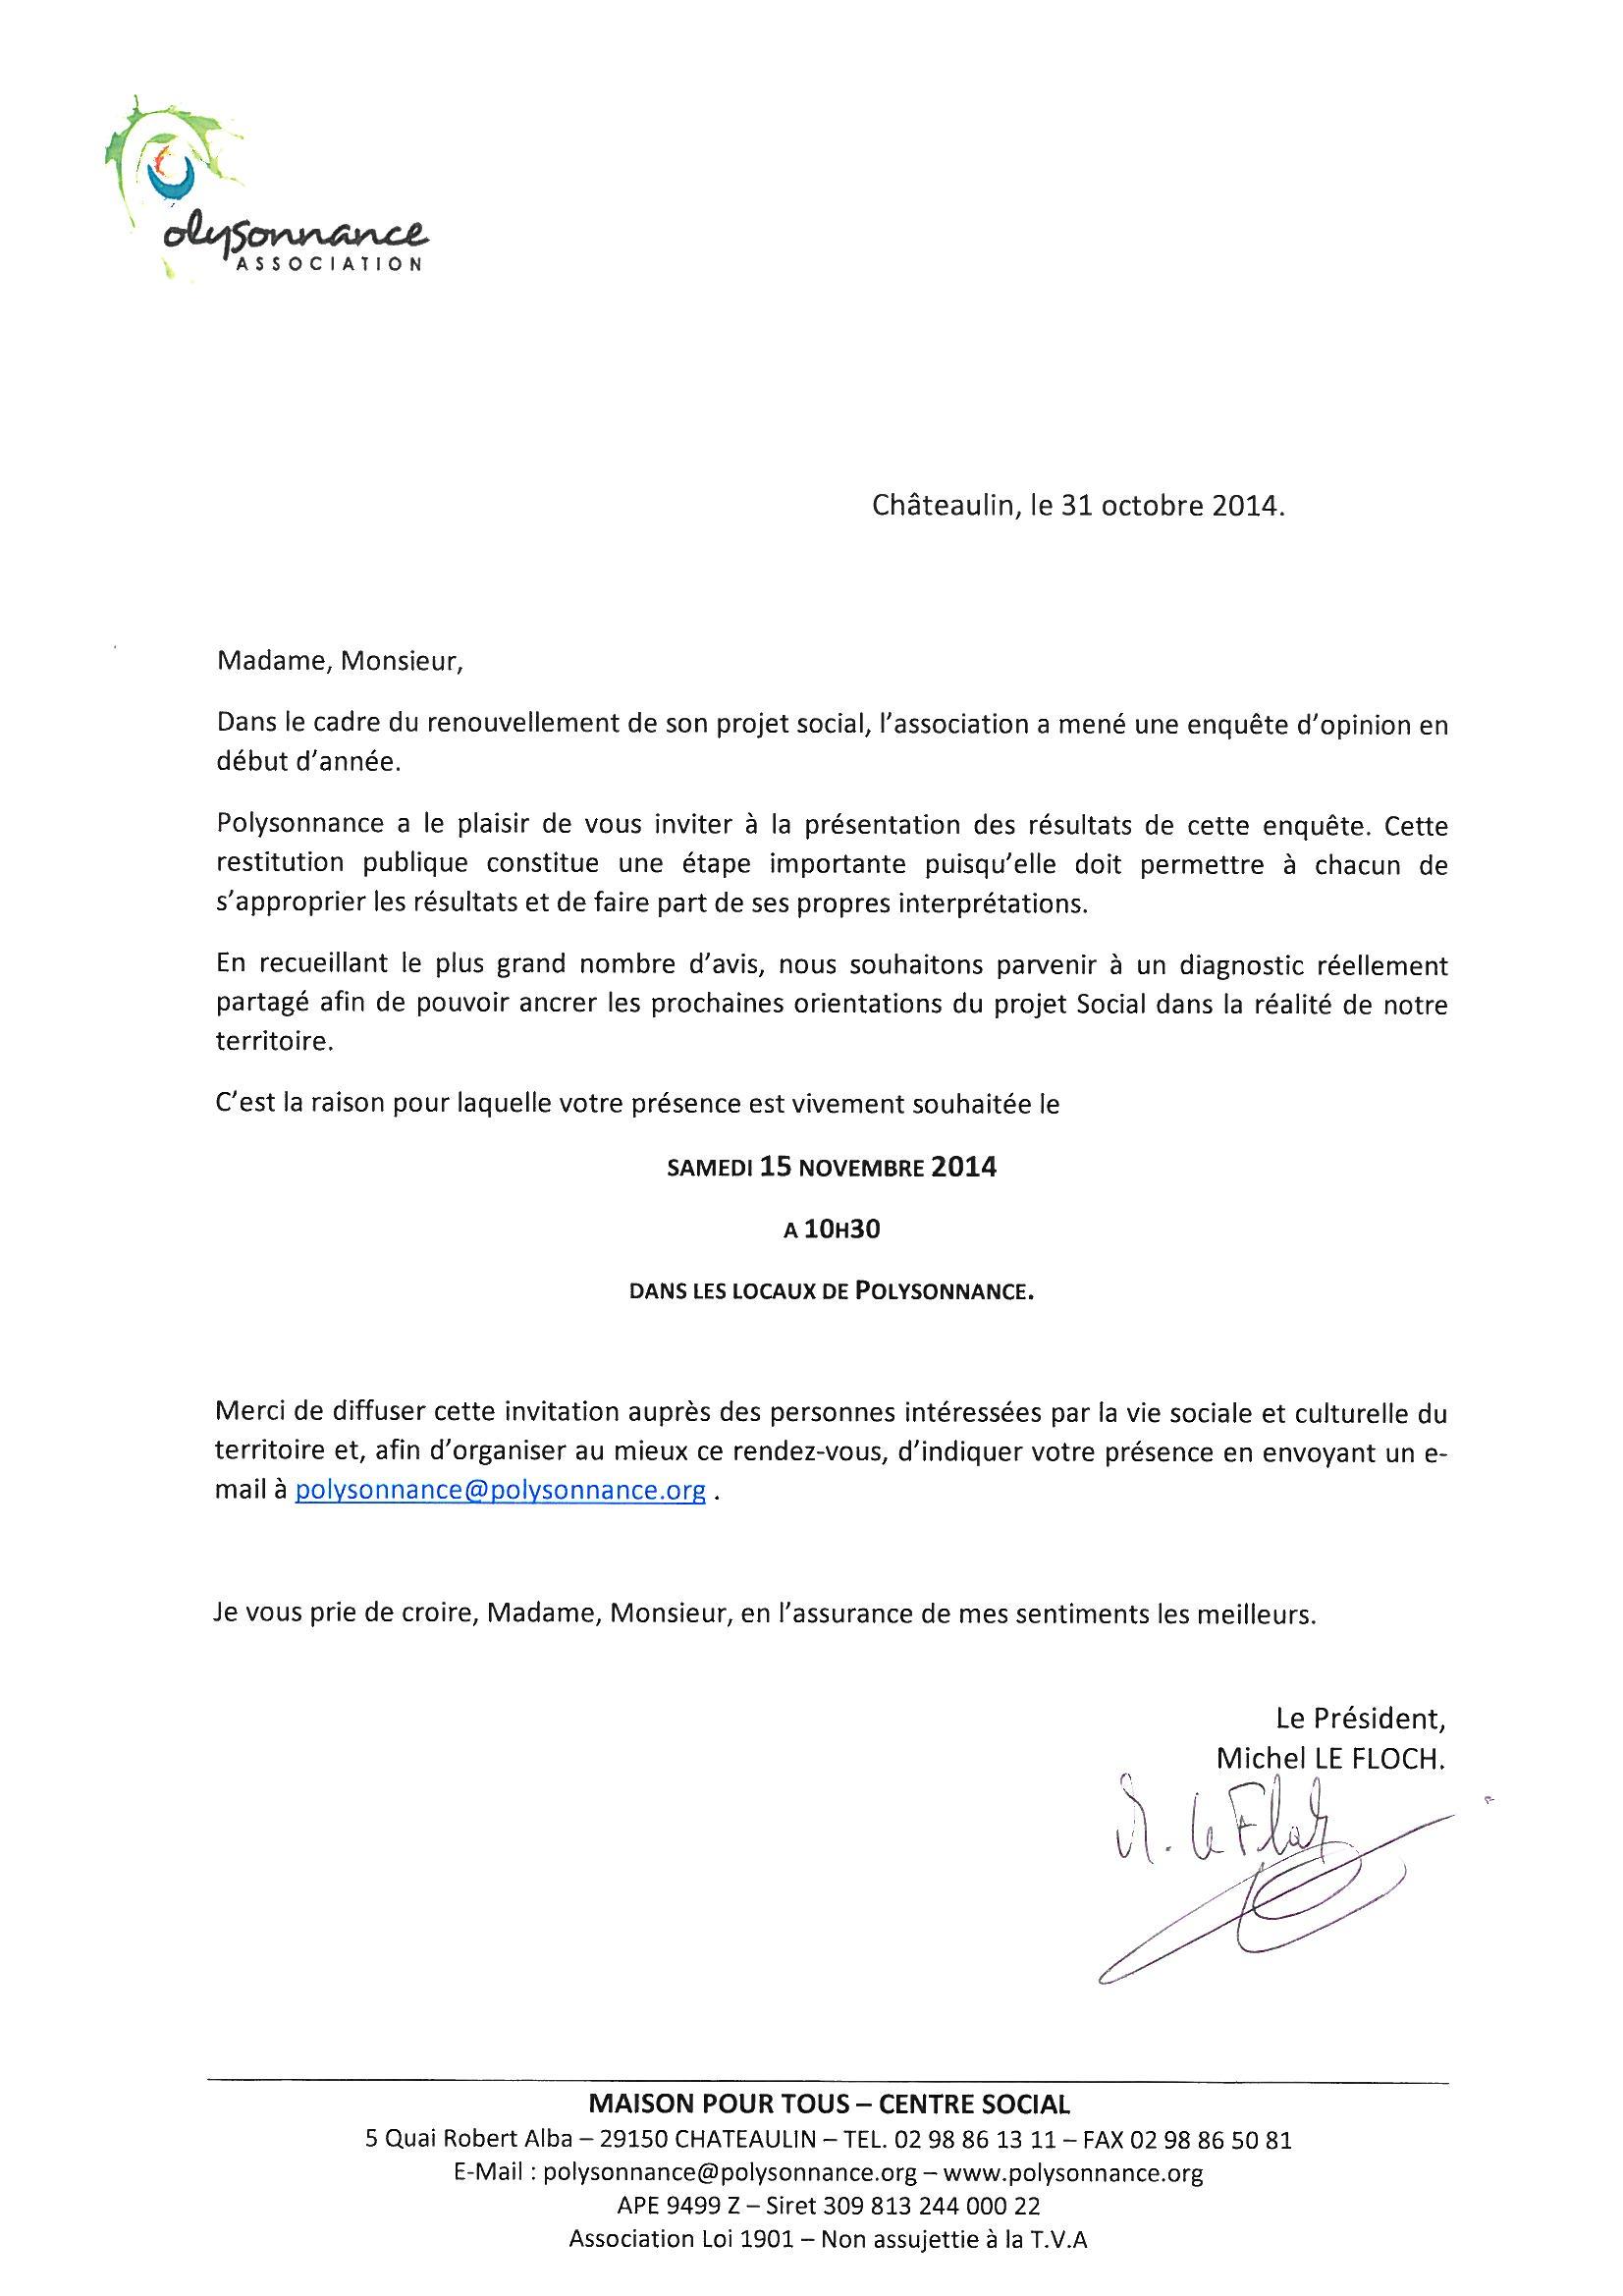 INVITATION REUNION PUBLIQUE SAMEDI 15 NOVEMBRE A 10H30 A LA MPT